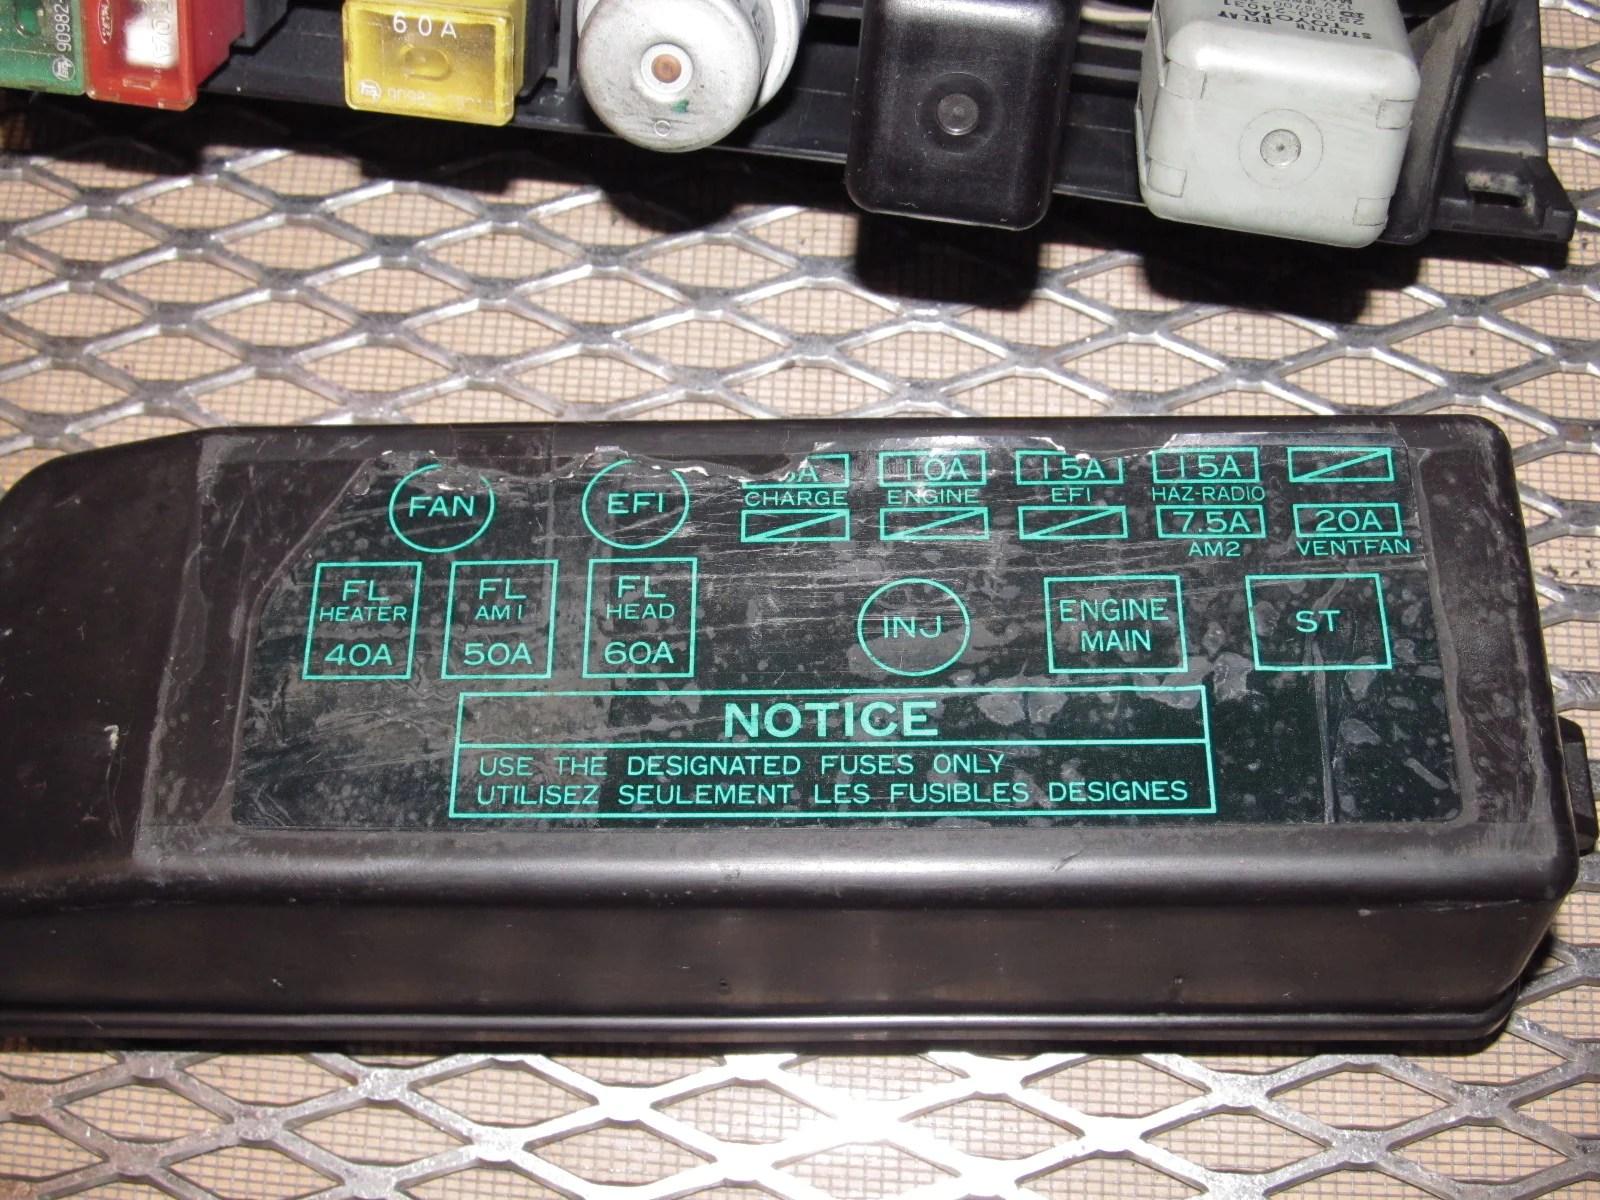 hight resolution of toyota mr2 mk1 fuse box wiring diagrams lol toyota mk1 mk1 mr2 fuse box